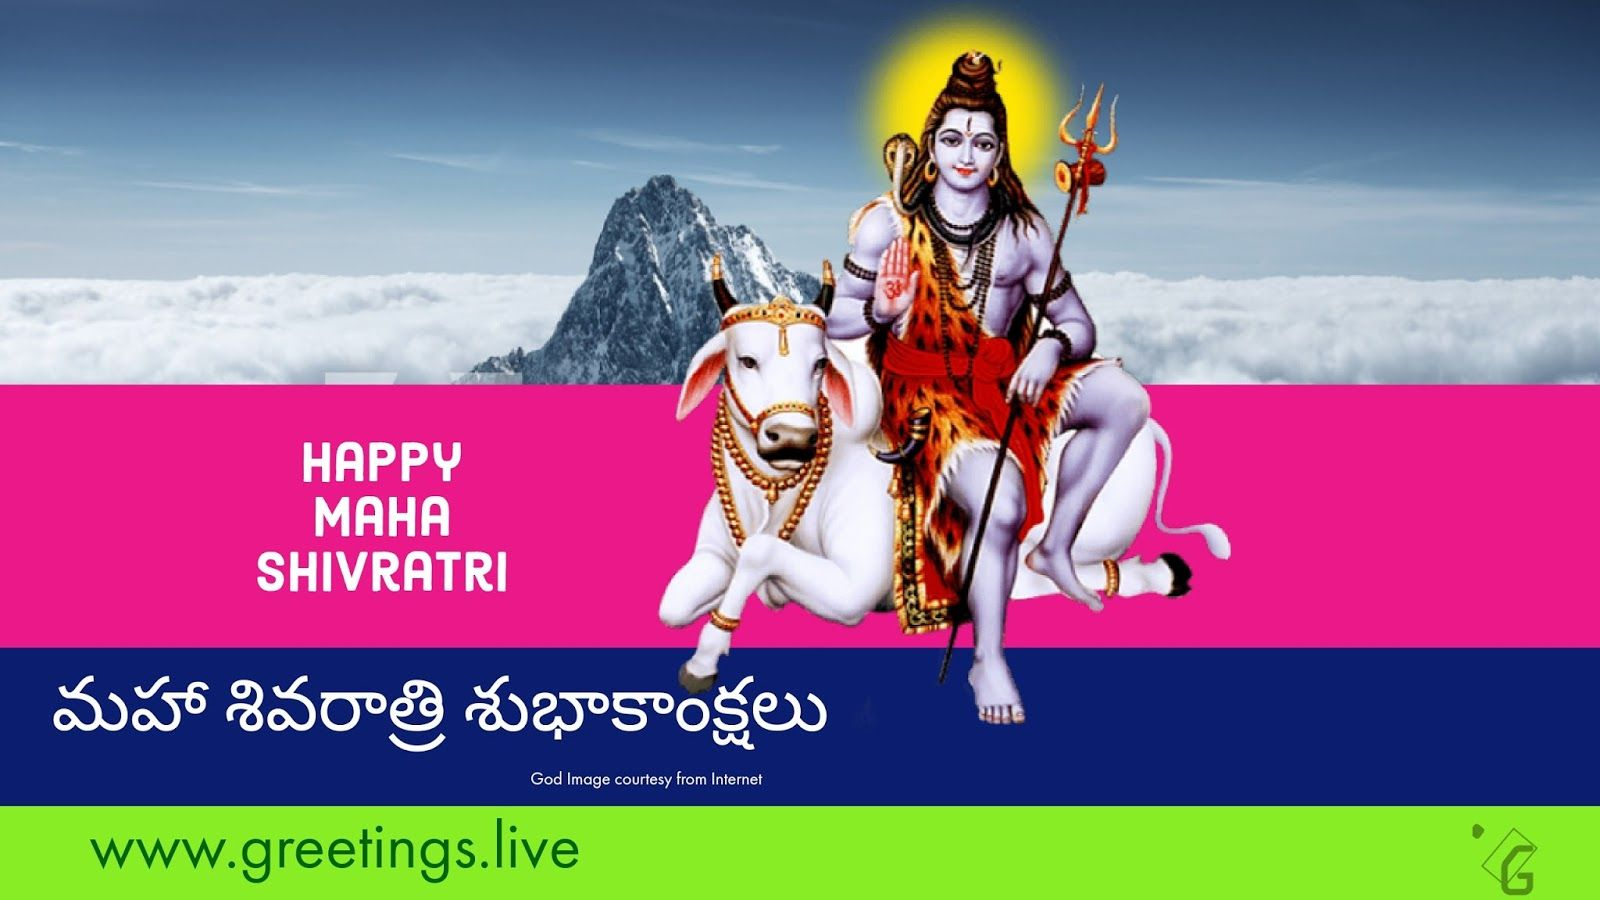 Happy Maha Shivratri Festival 2018 Wishes In Telugu Language